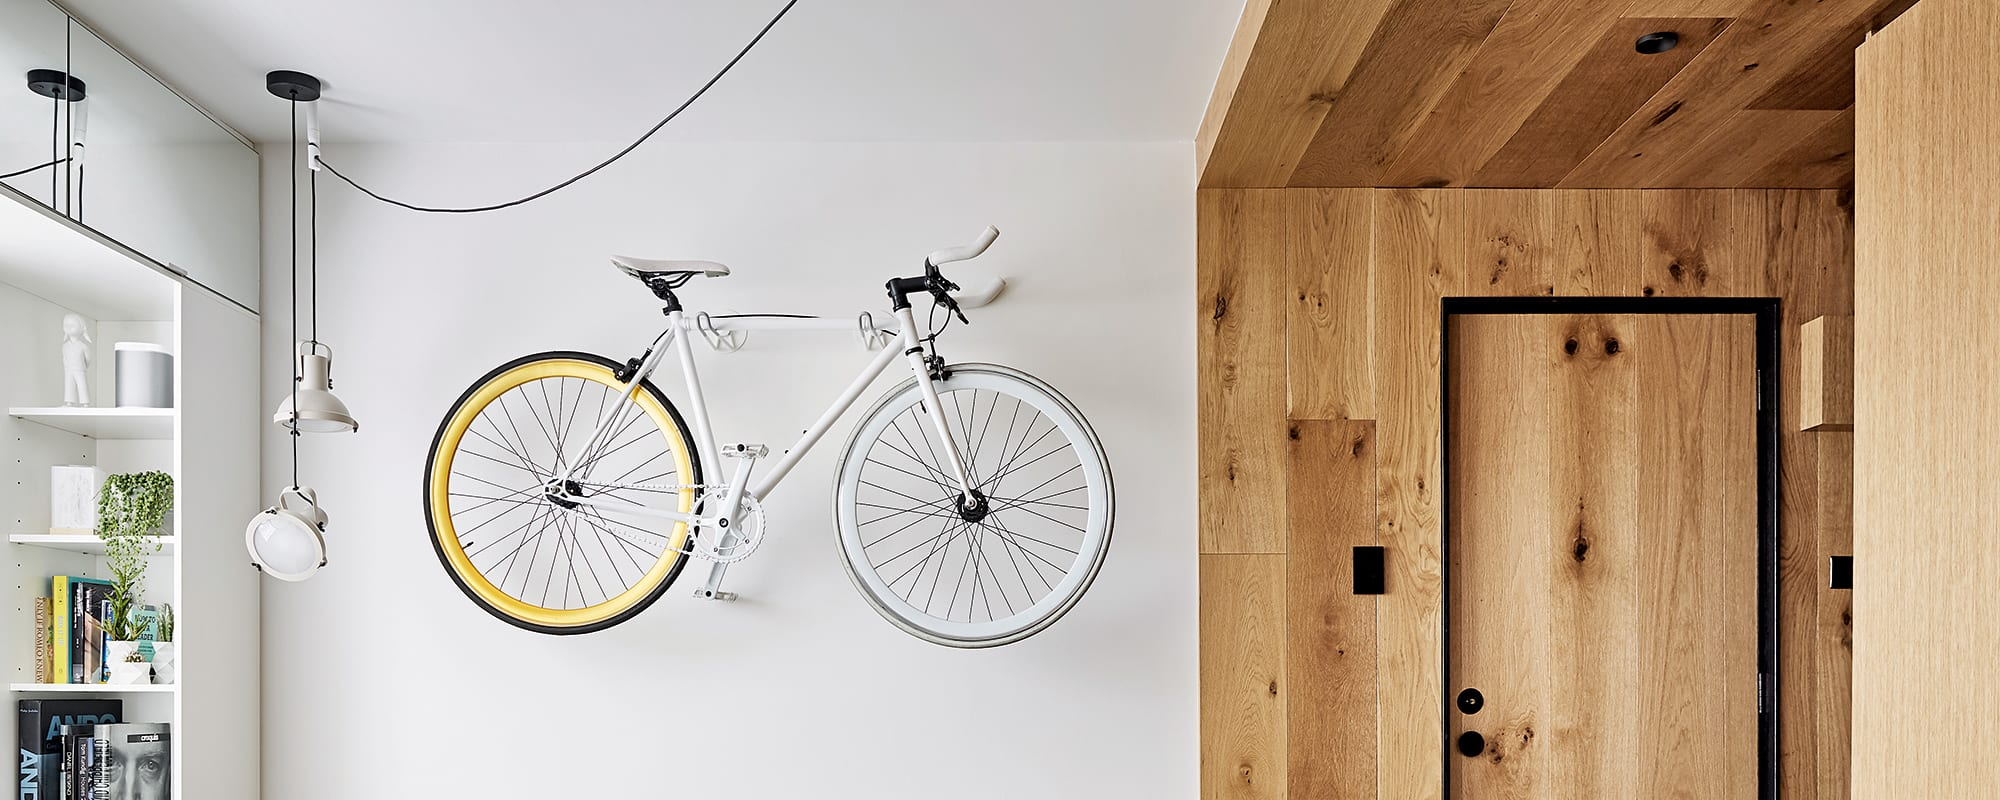 Tsai Design, Type Street Apartment, Entre, Eichenholz, Beistelltisch, Sofa